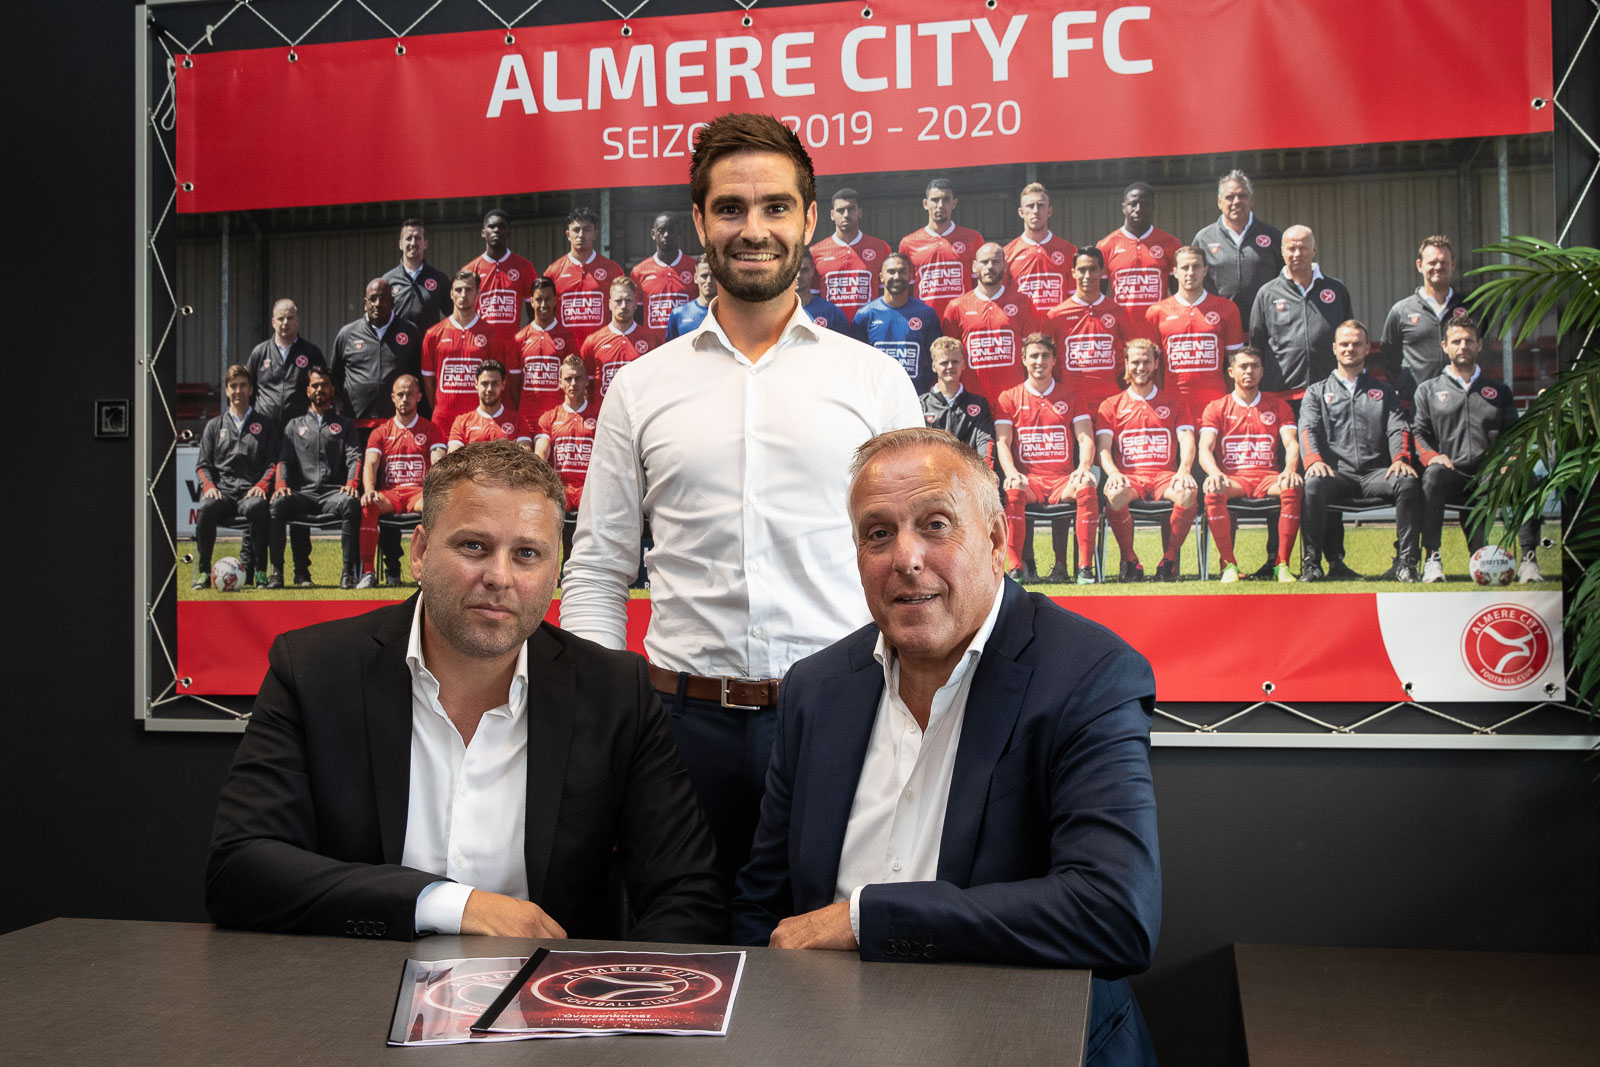 Pro Season 'game changer' in businessclub Almere City FC